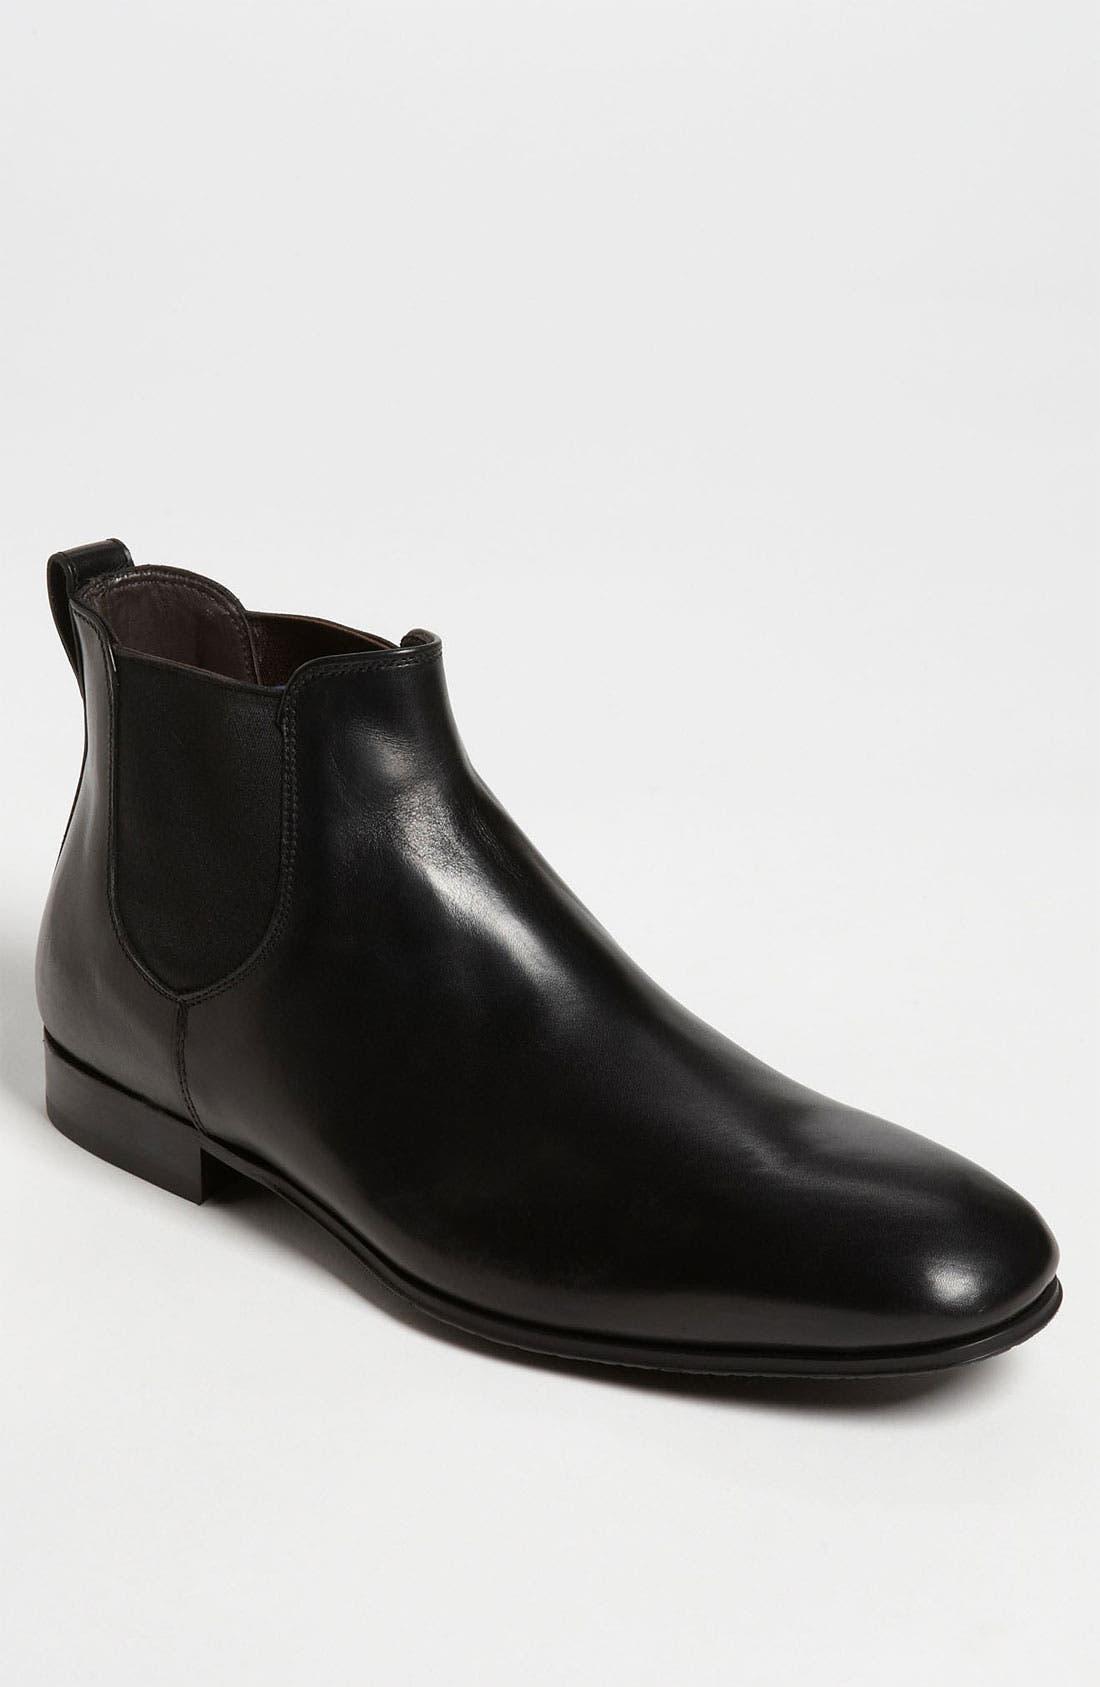 TO BOOT NEW YORK 'Luke' Chelsea Boot, Main, color, 001